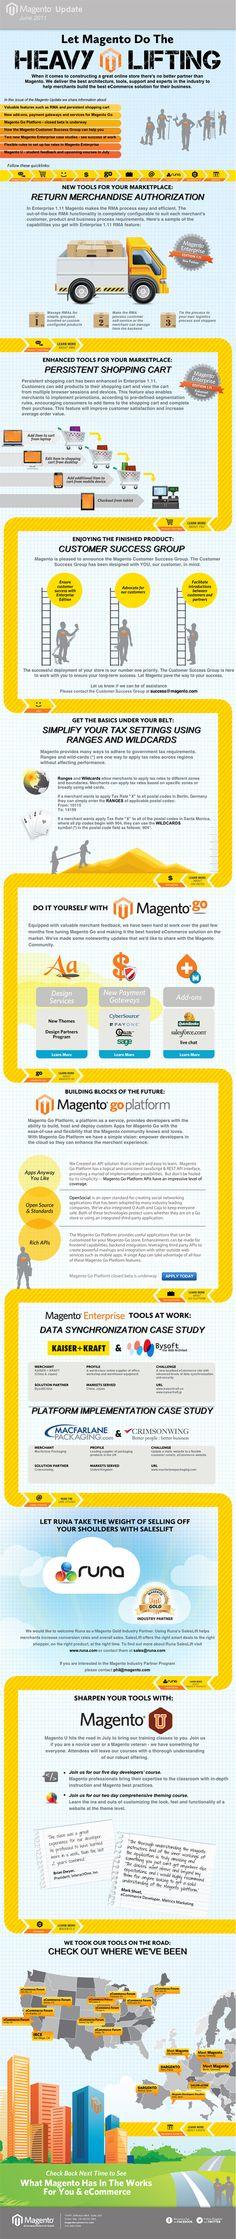 Magento vs osCommerce vs OpenCart - A Comparison Ecommerce Pinterest - social security request form